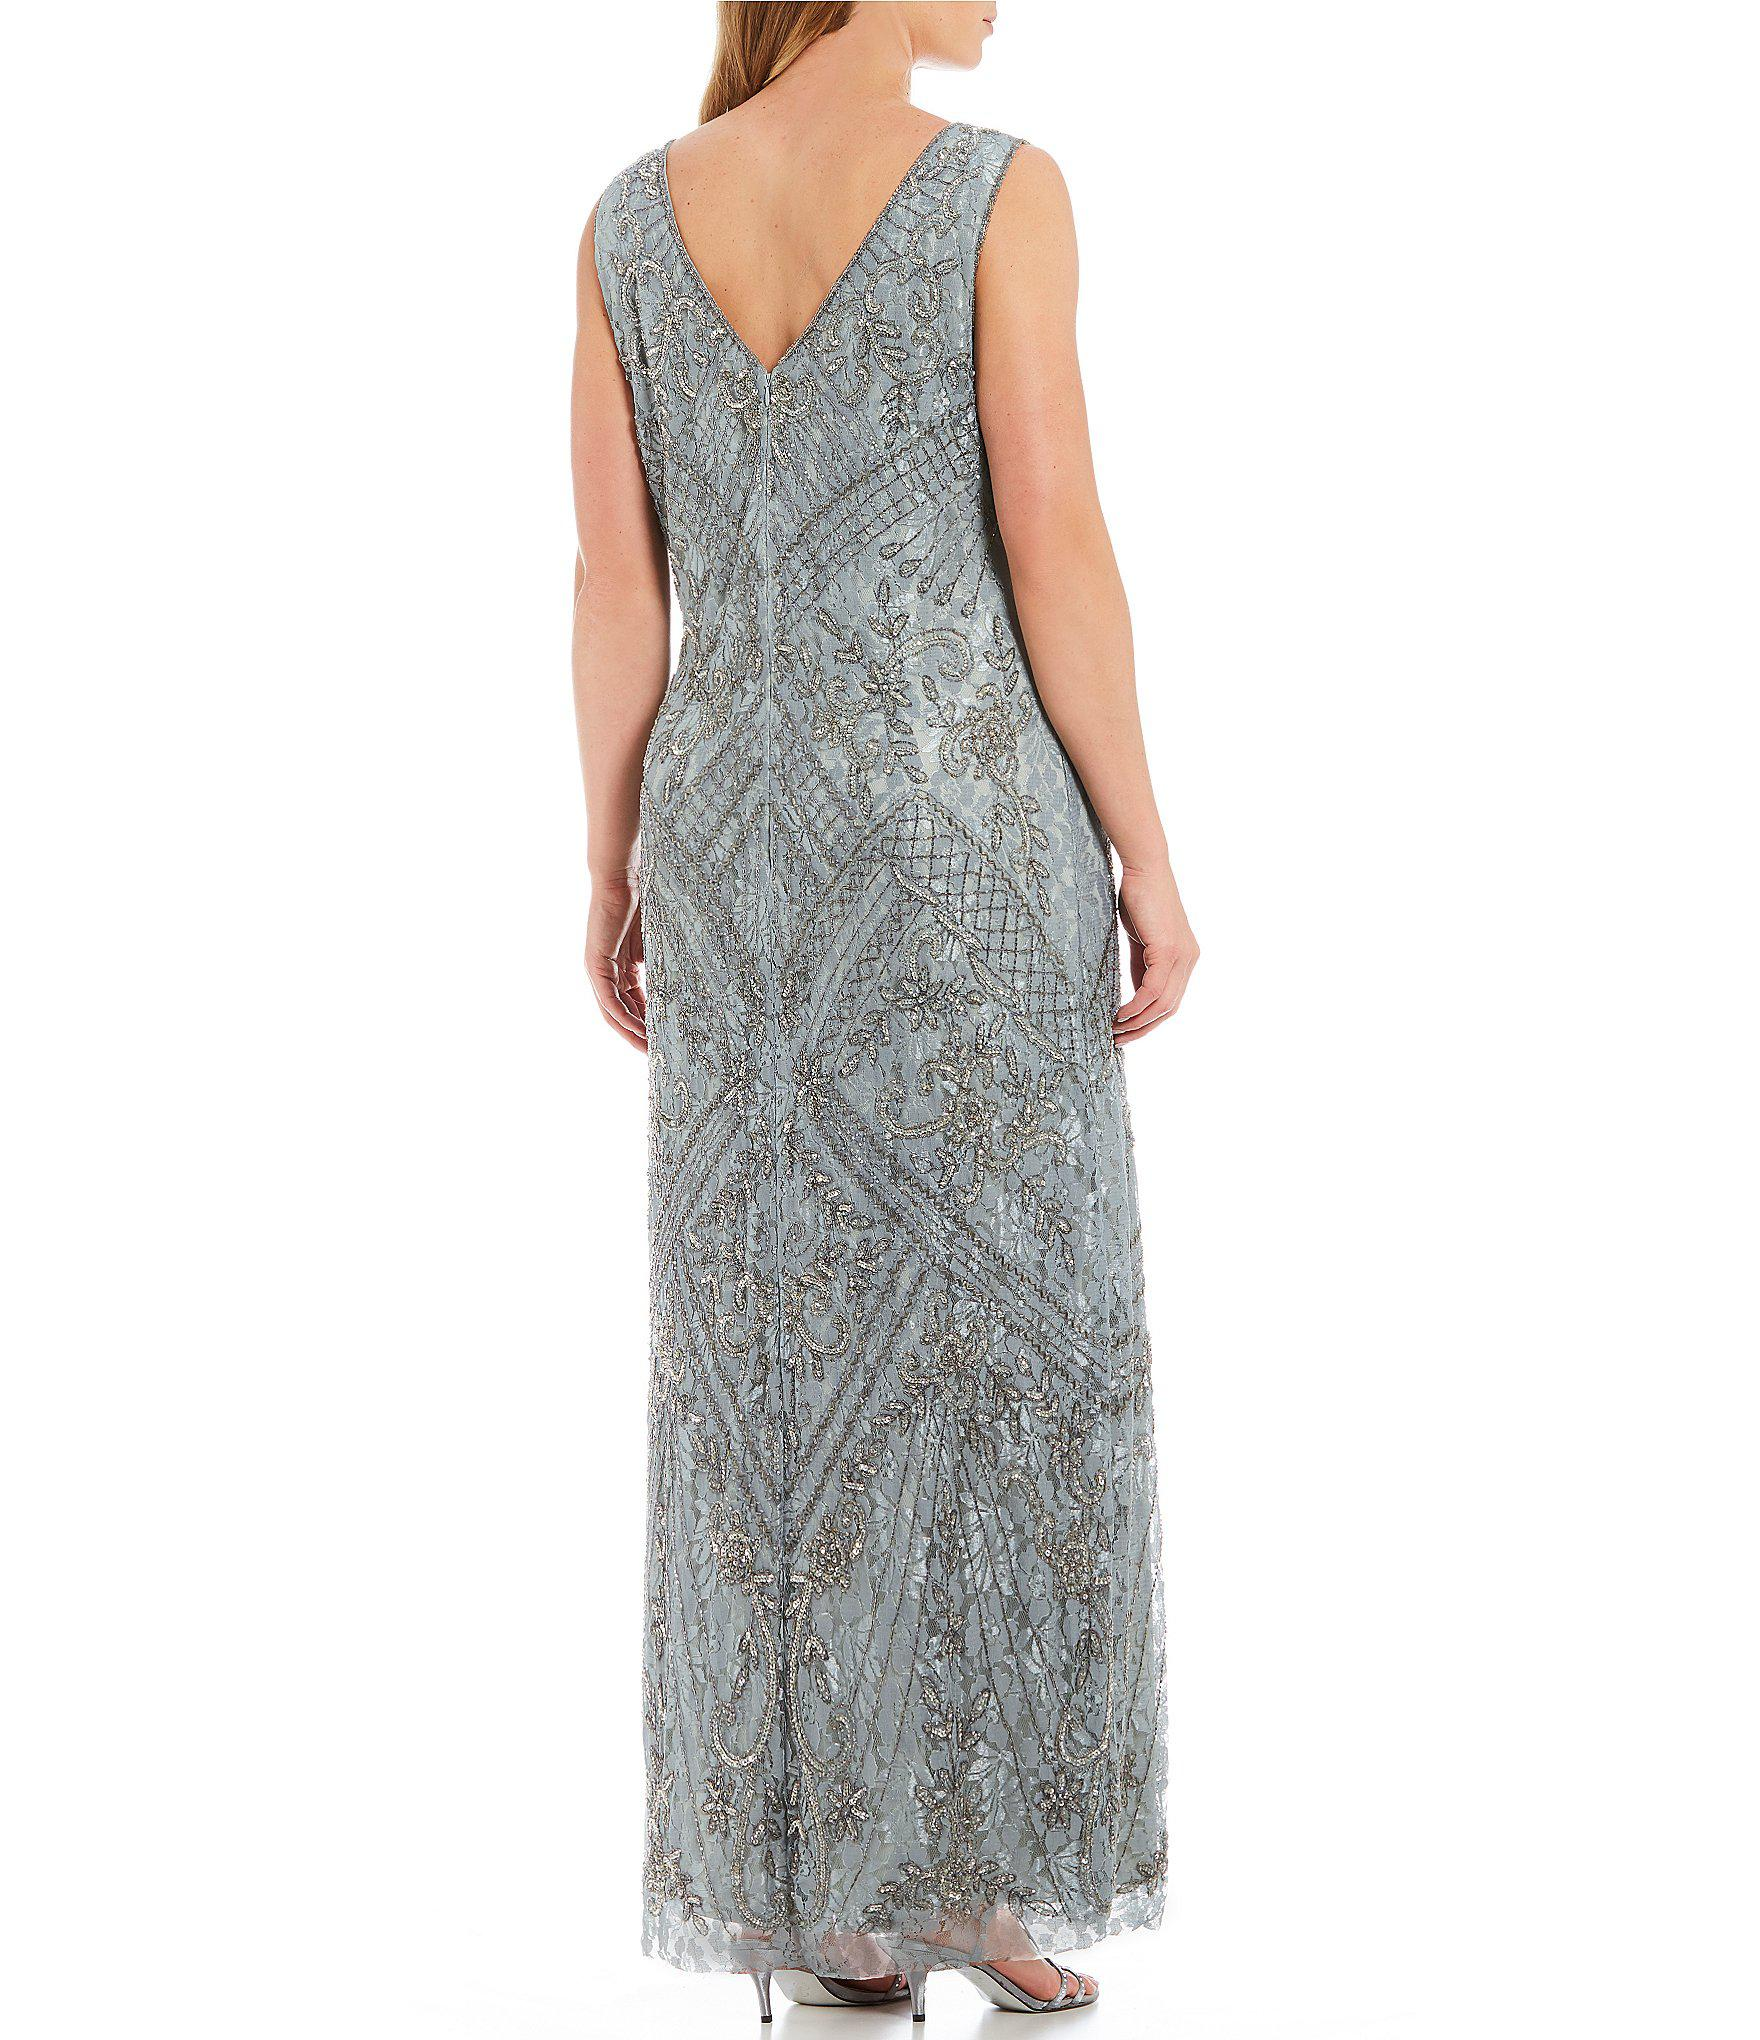 09ad52c8843 Pisarro Nights - Metallic Plus Size Sleeveless Beaded Lace Gown - Lyst.  View fullscreen